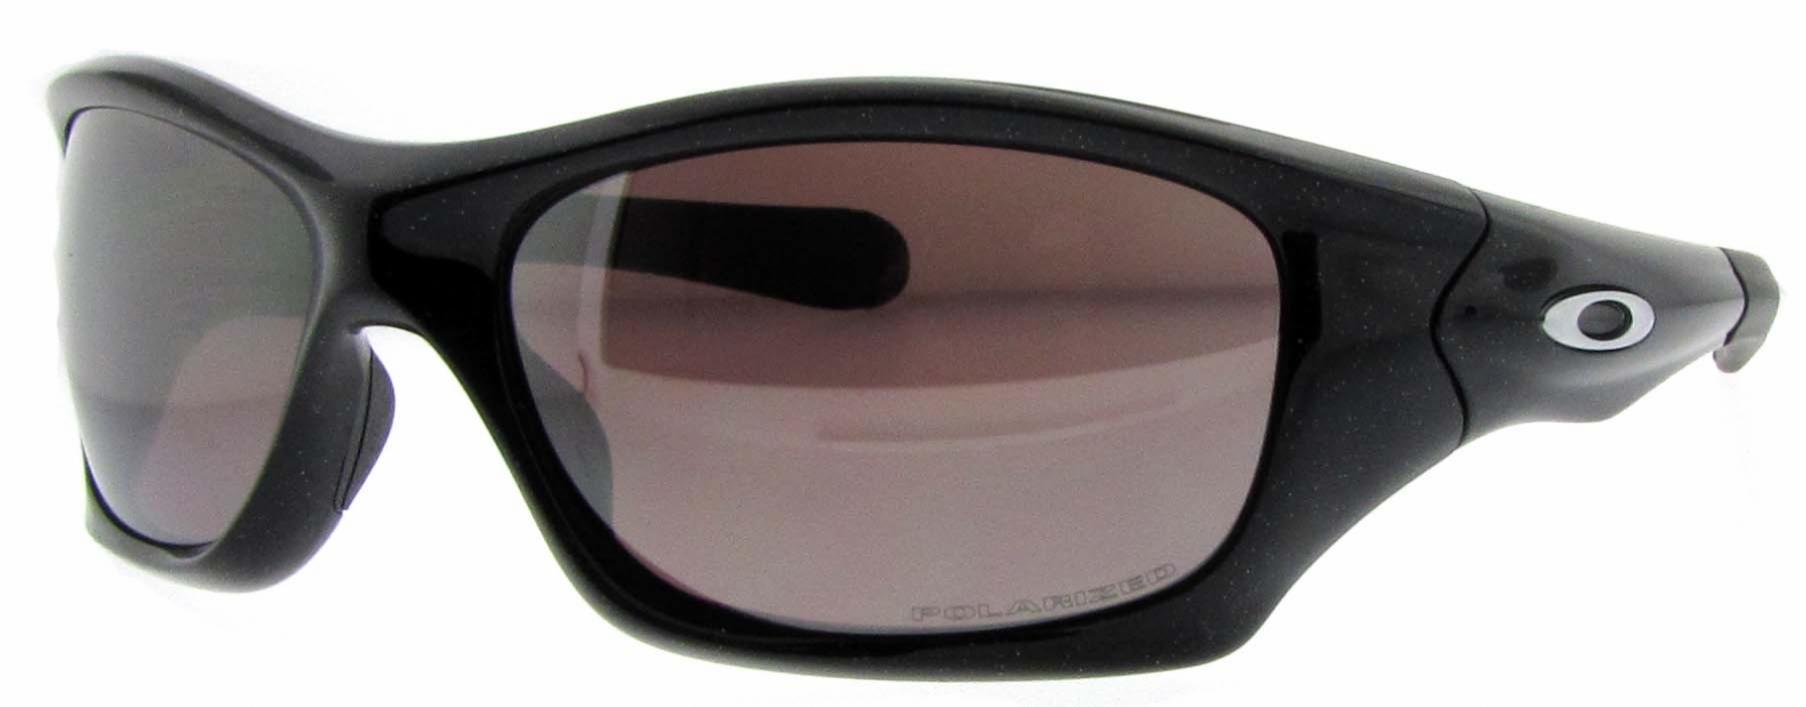 Oakley Pitbull Sunglasses  oakley pit bull sunglasses